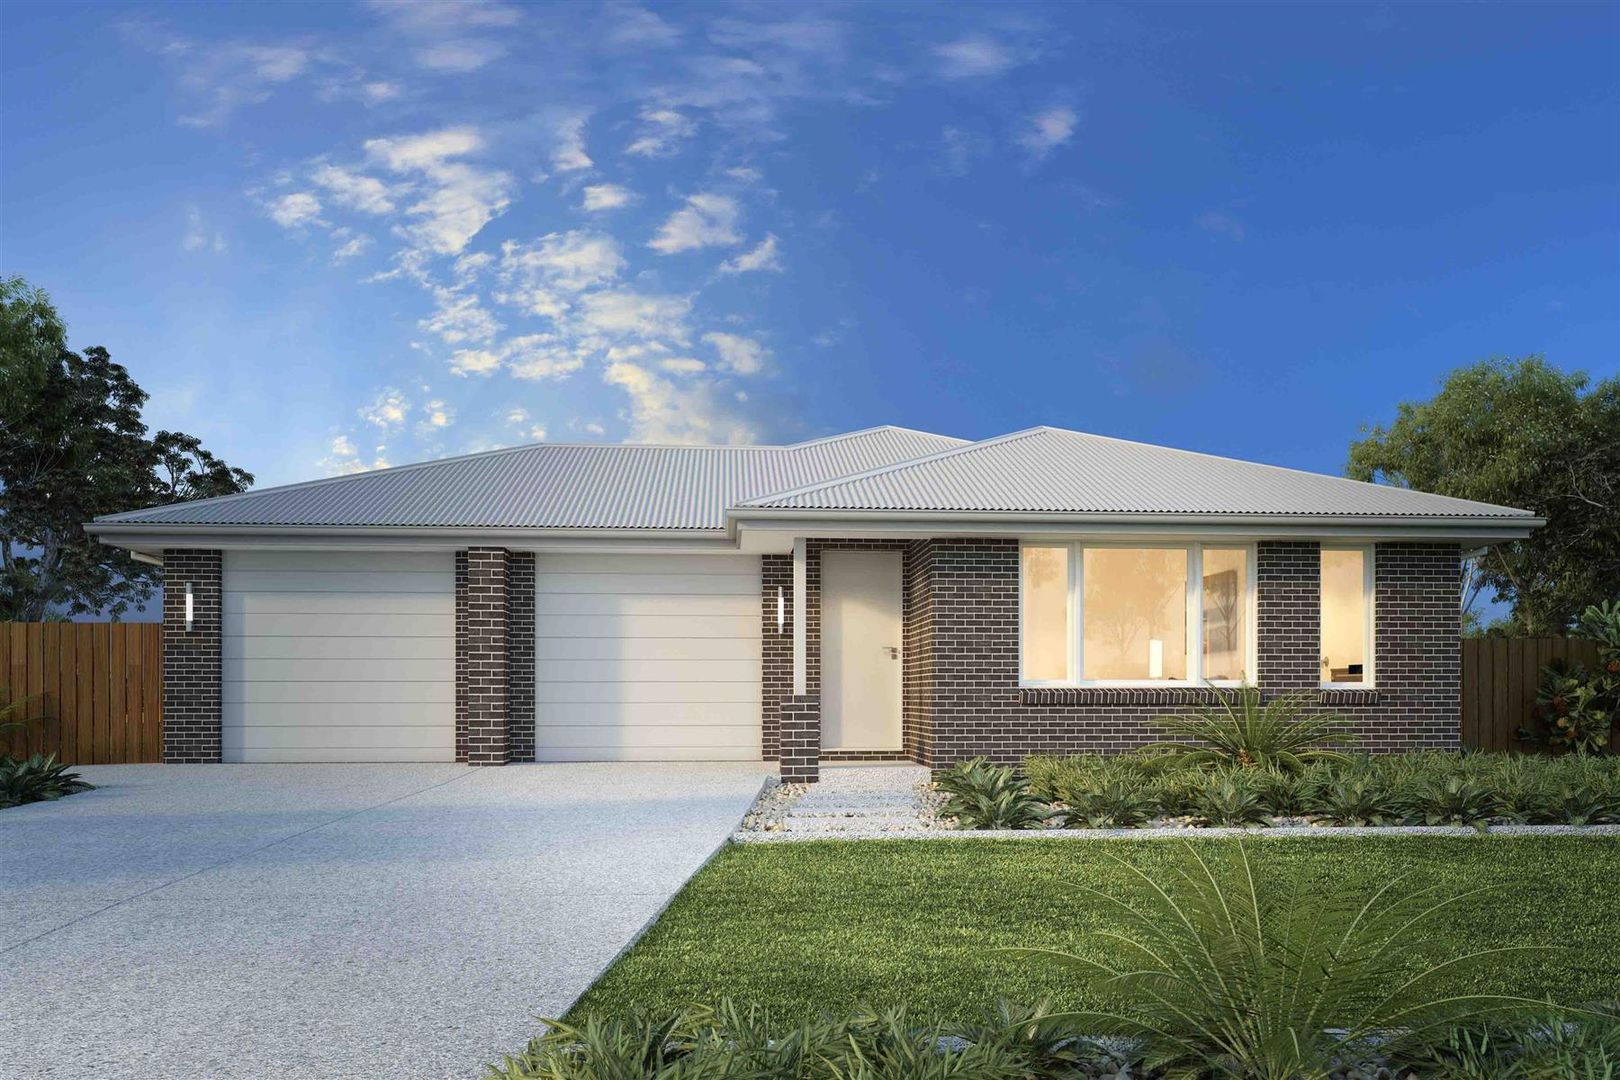 Lot 1116, 51 Currawong Drive, Lampada Estate, Calala NSW 2340, Image 0